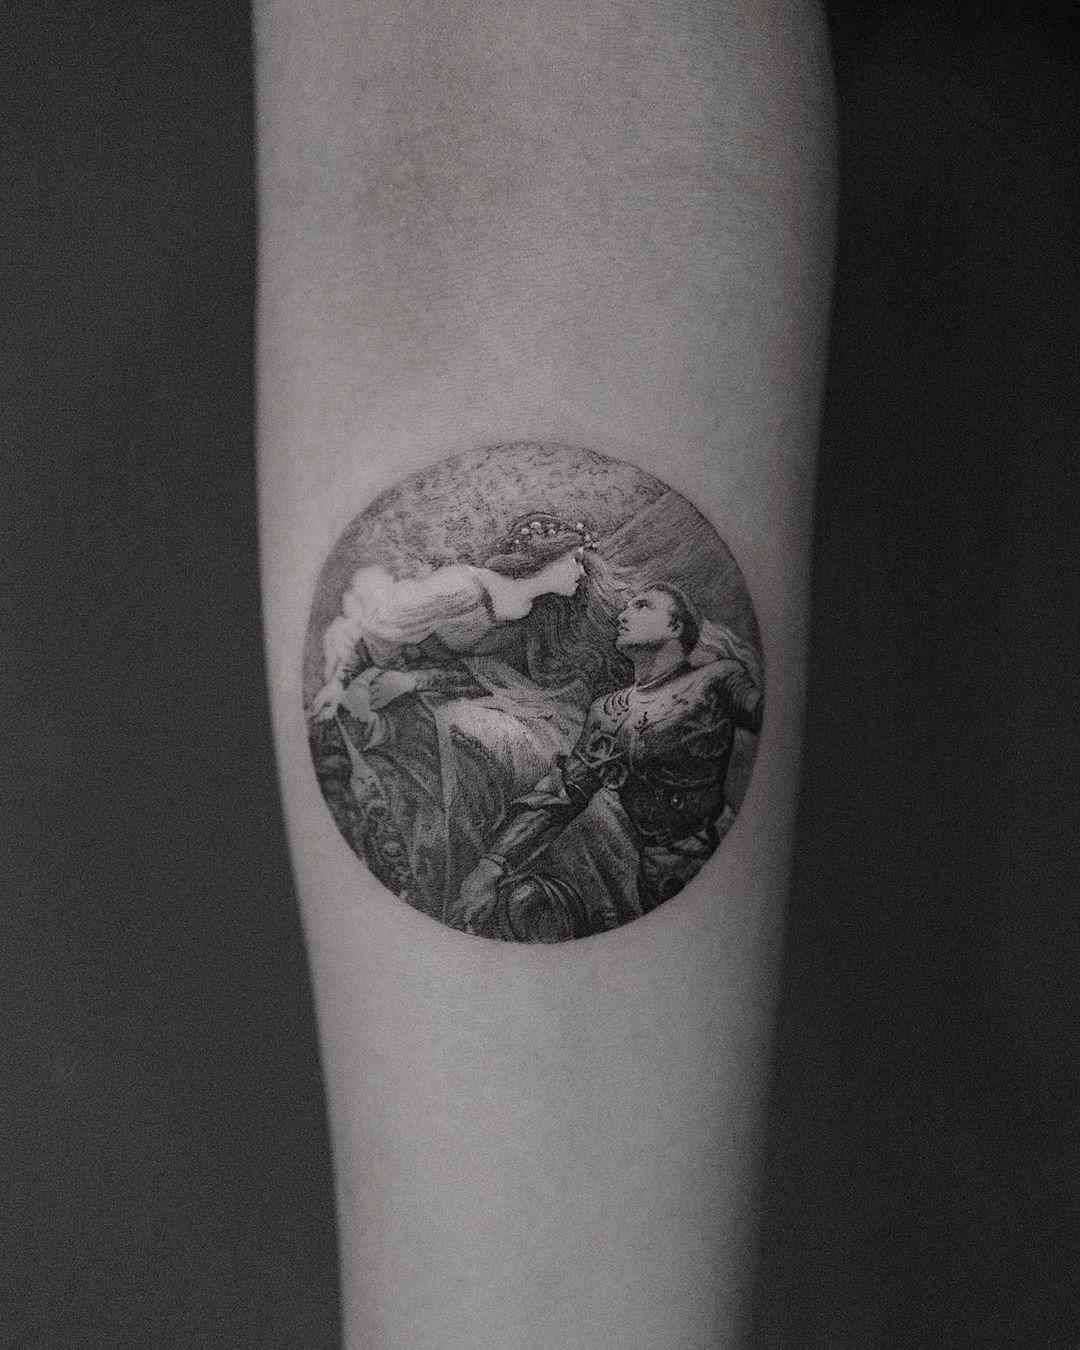 La Belle Dame Sans Merci tattoo @coldgraytattoo